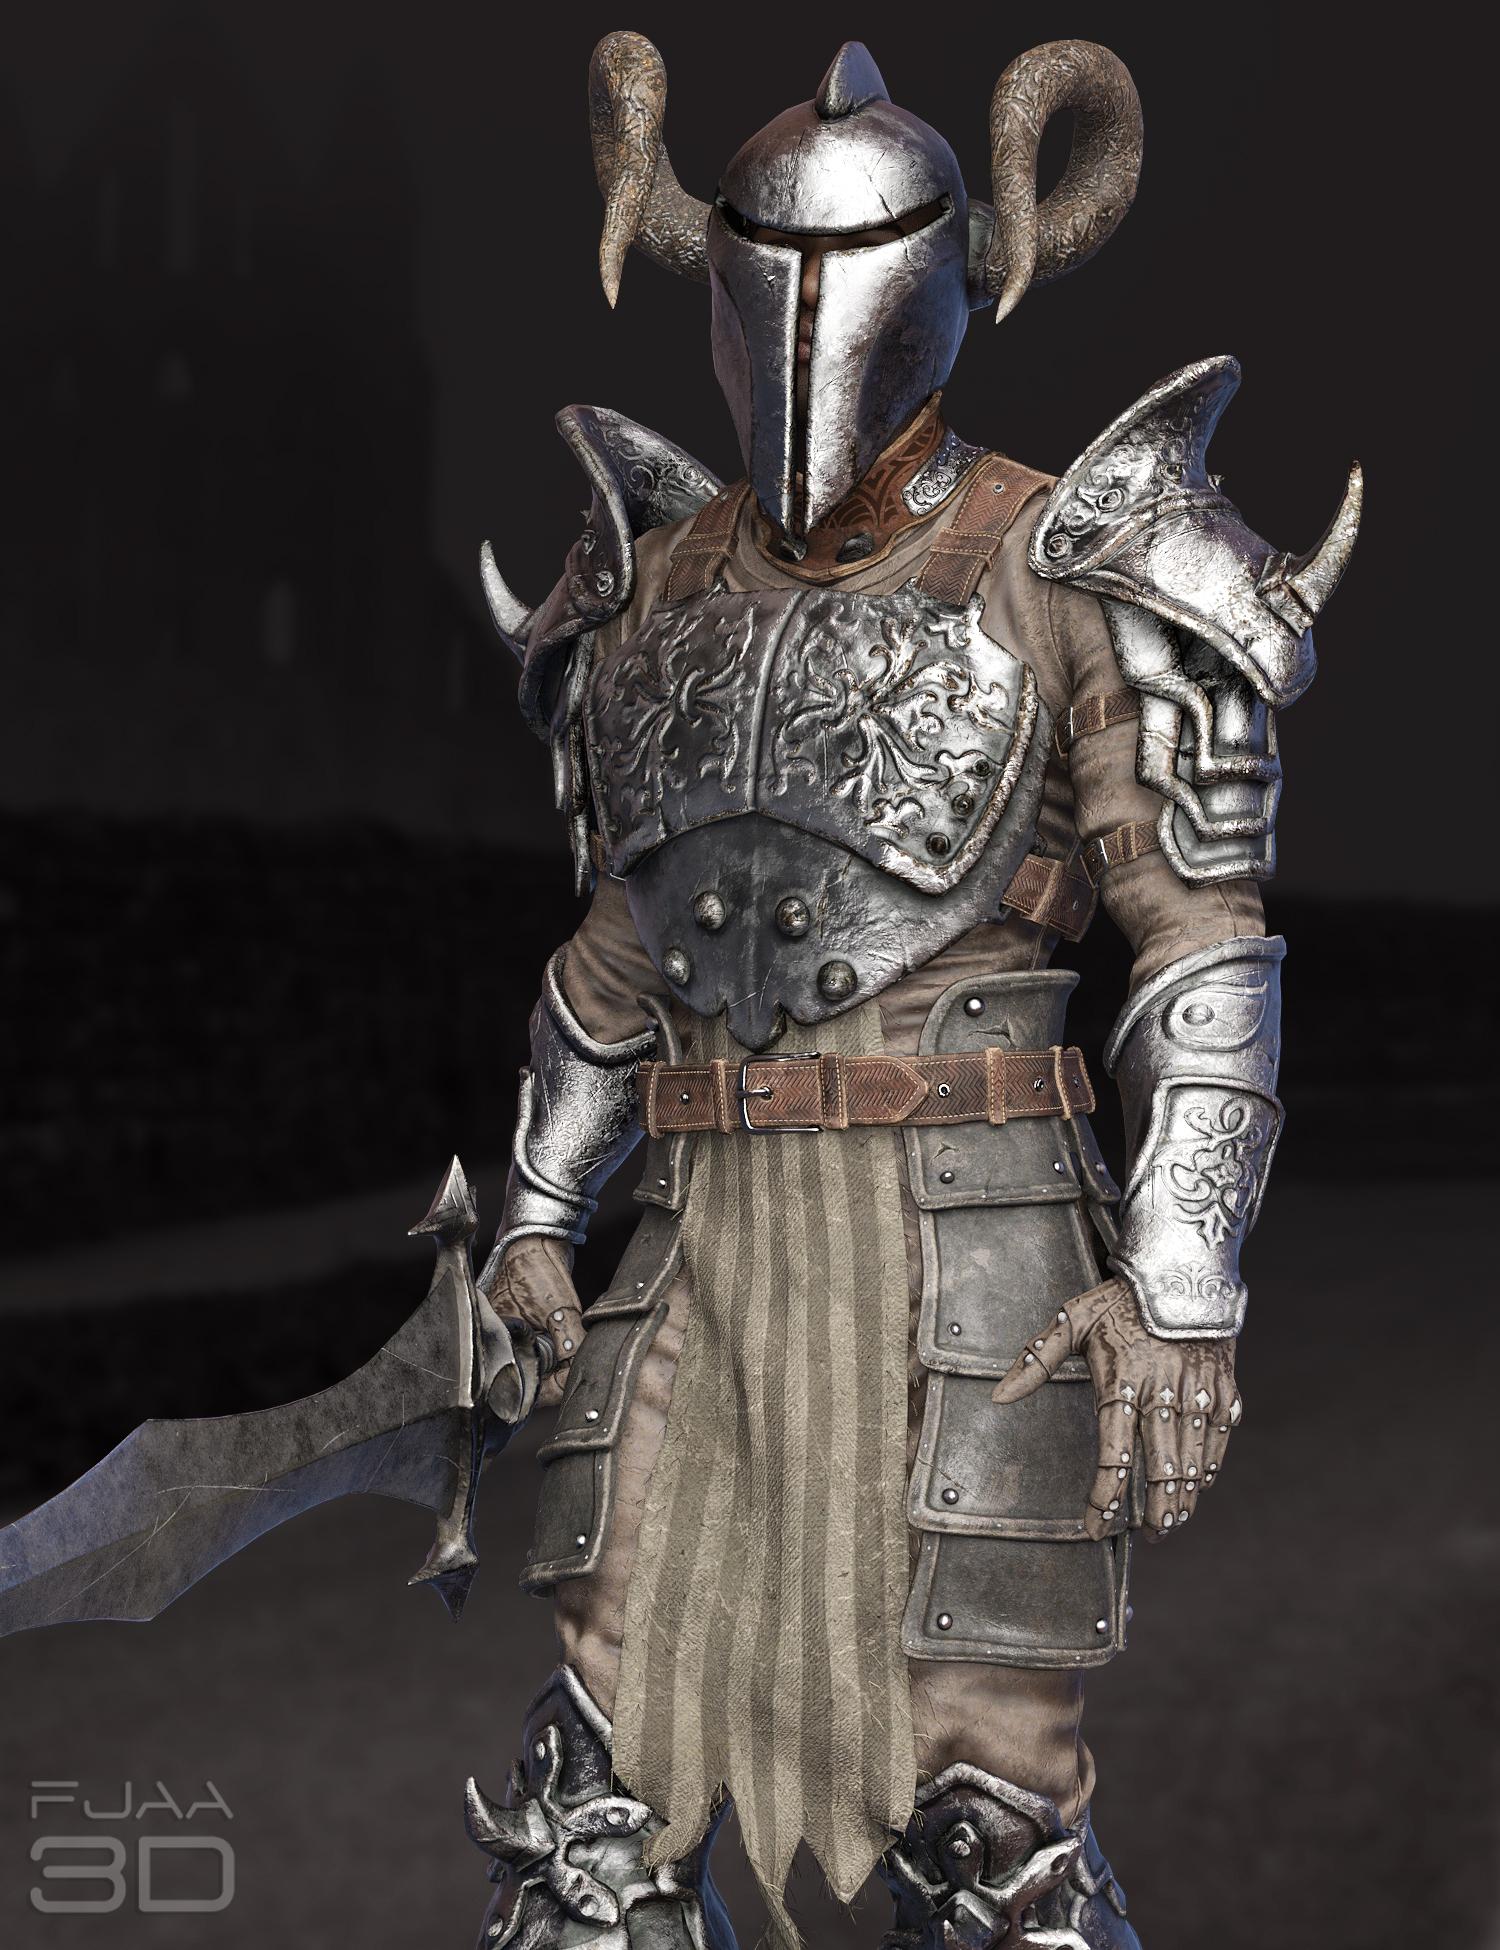 dForce Death Fighter Armor for Genesis 8 Males by: fjaa3d, 3D Models by Daz 3D